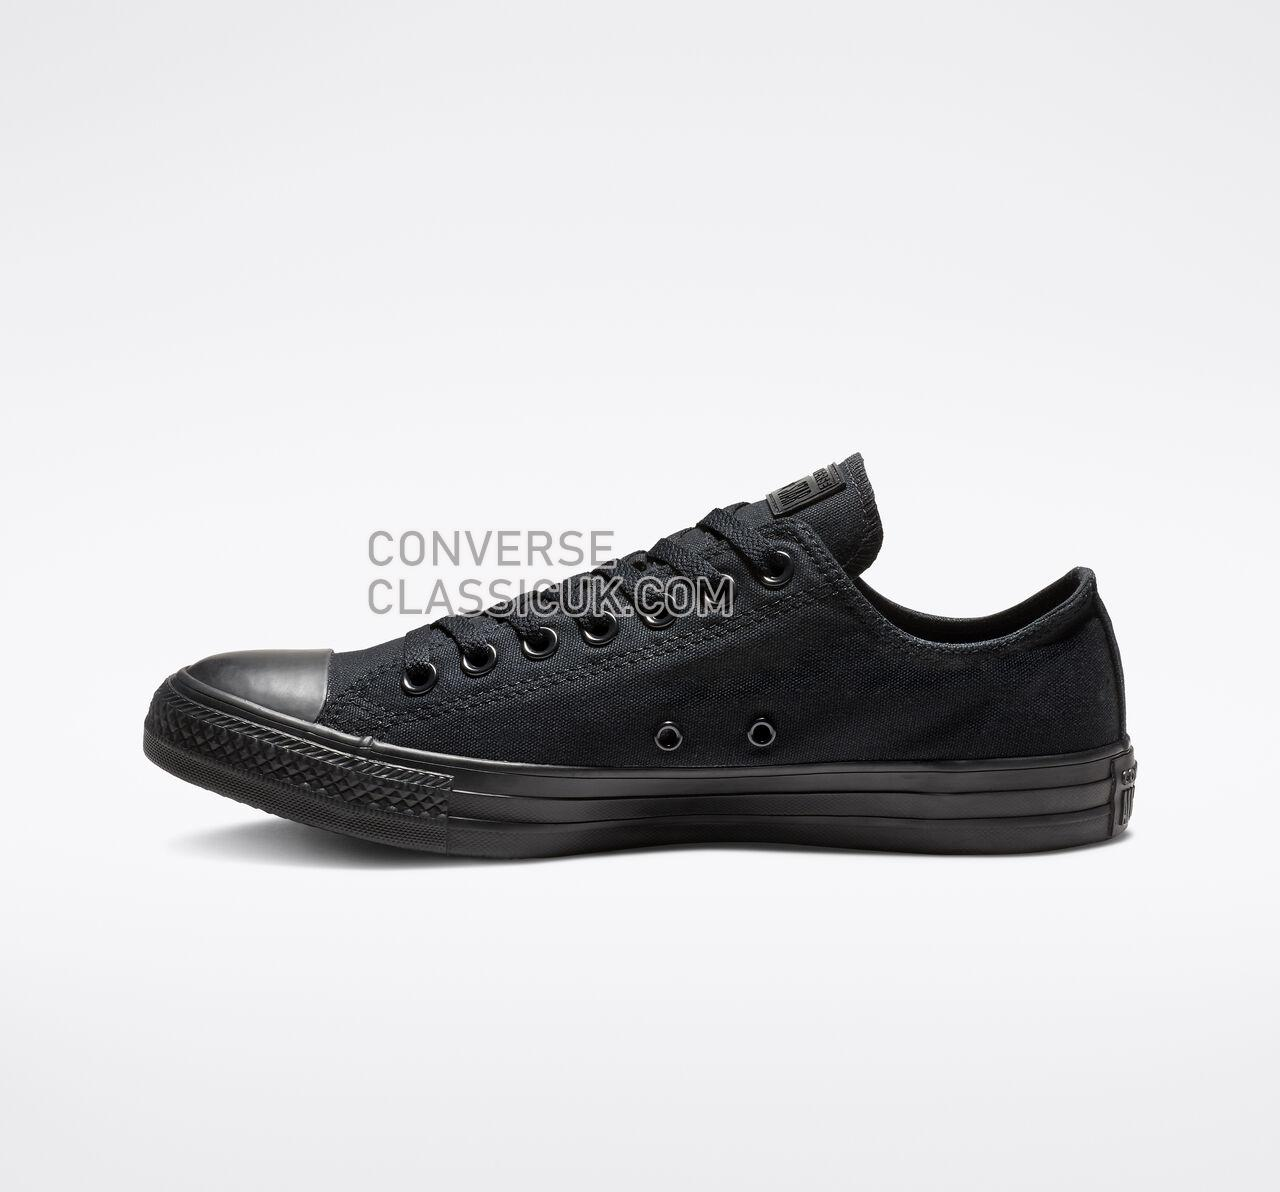 Converse Chuck Taylor All Star Low Top Mens Womens Unisex M5039 Black Monochrome Shoes